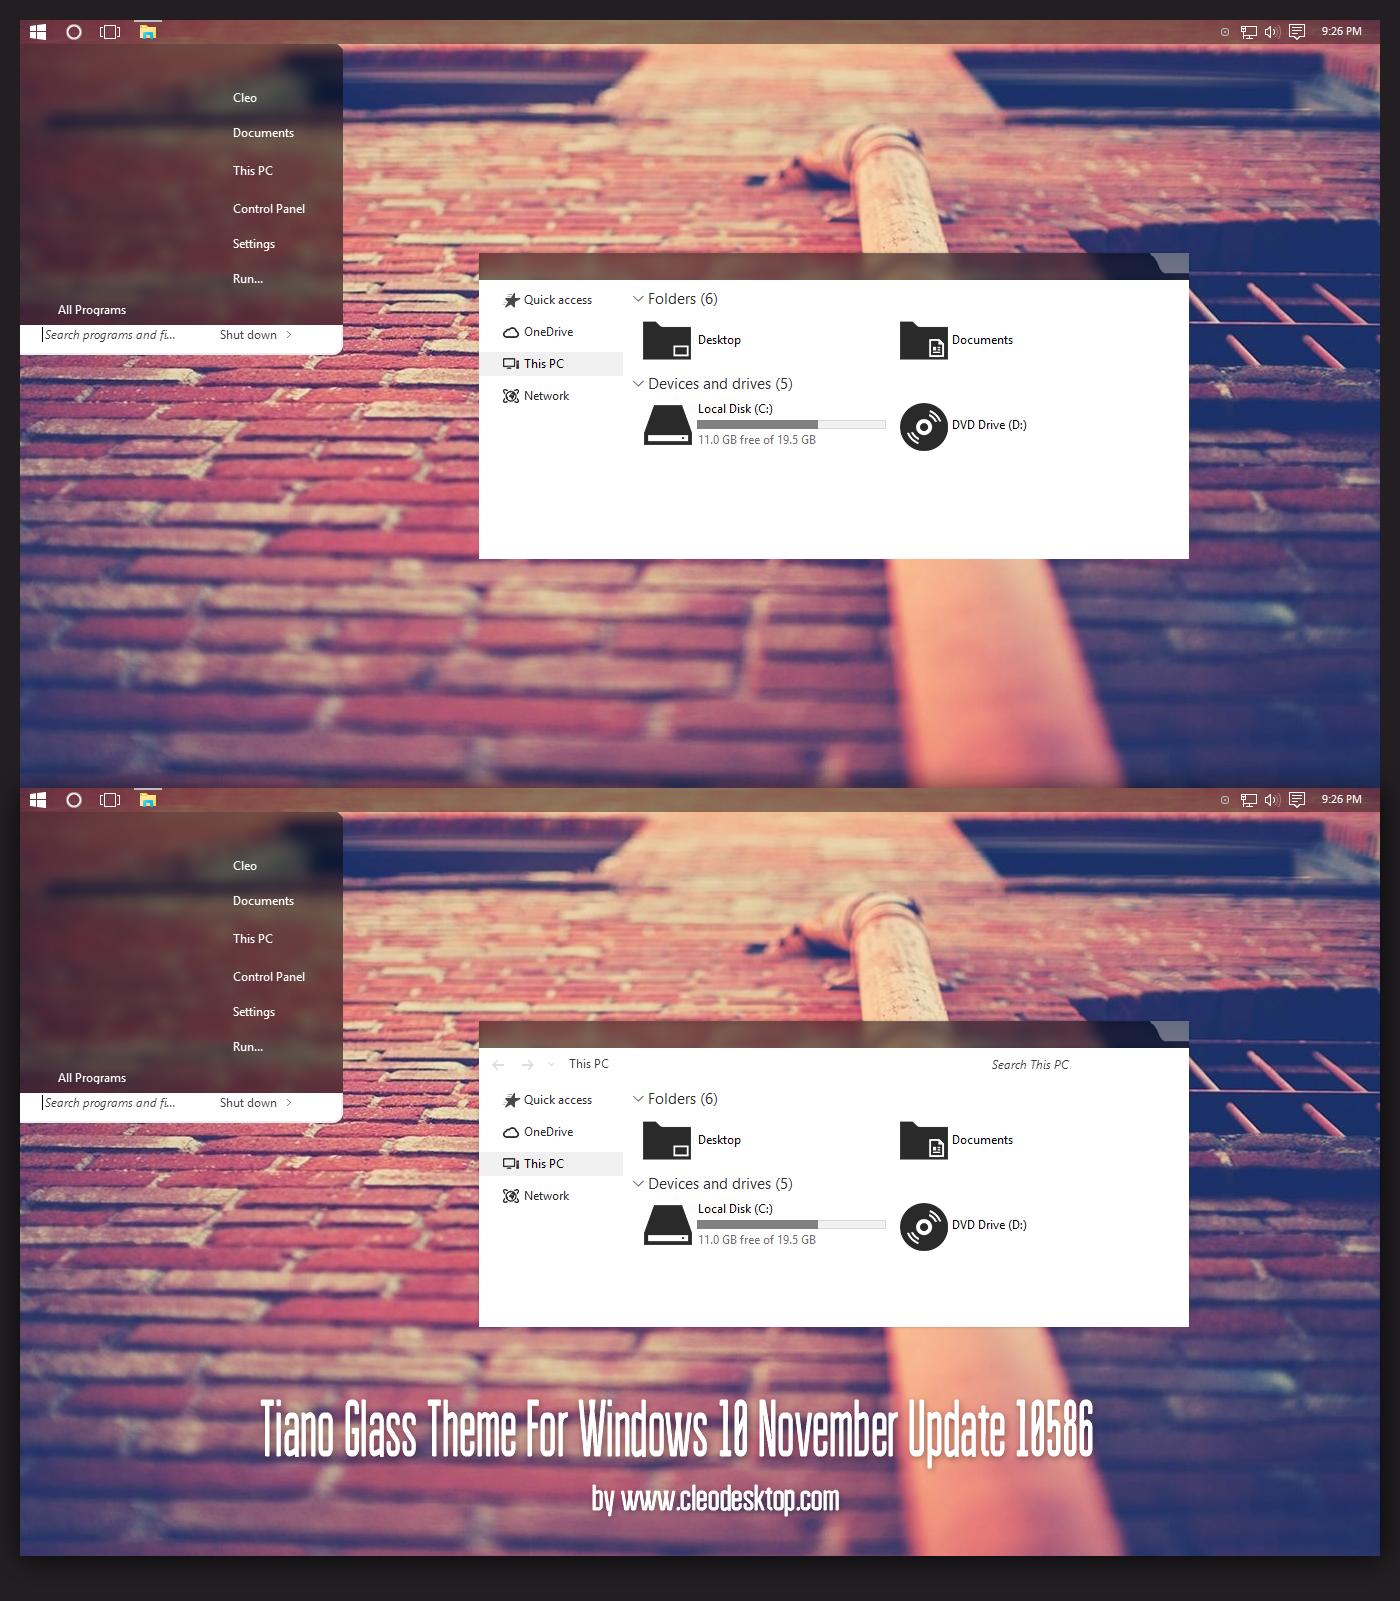 Tiano Glass Theme Windows 10 TH2 Build 10586 aka 1